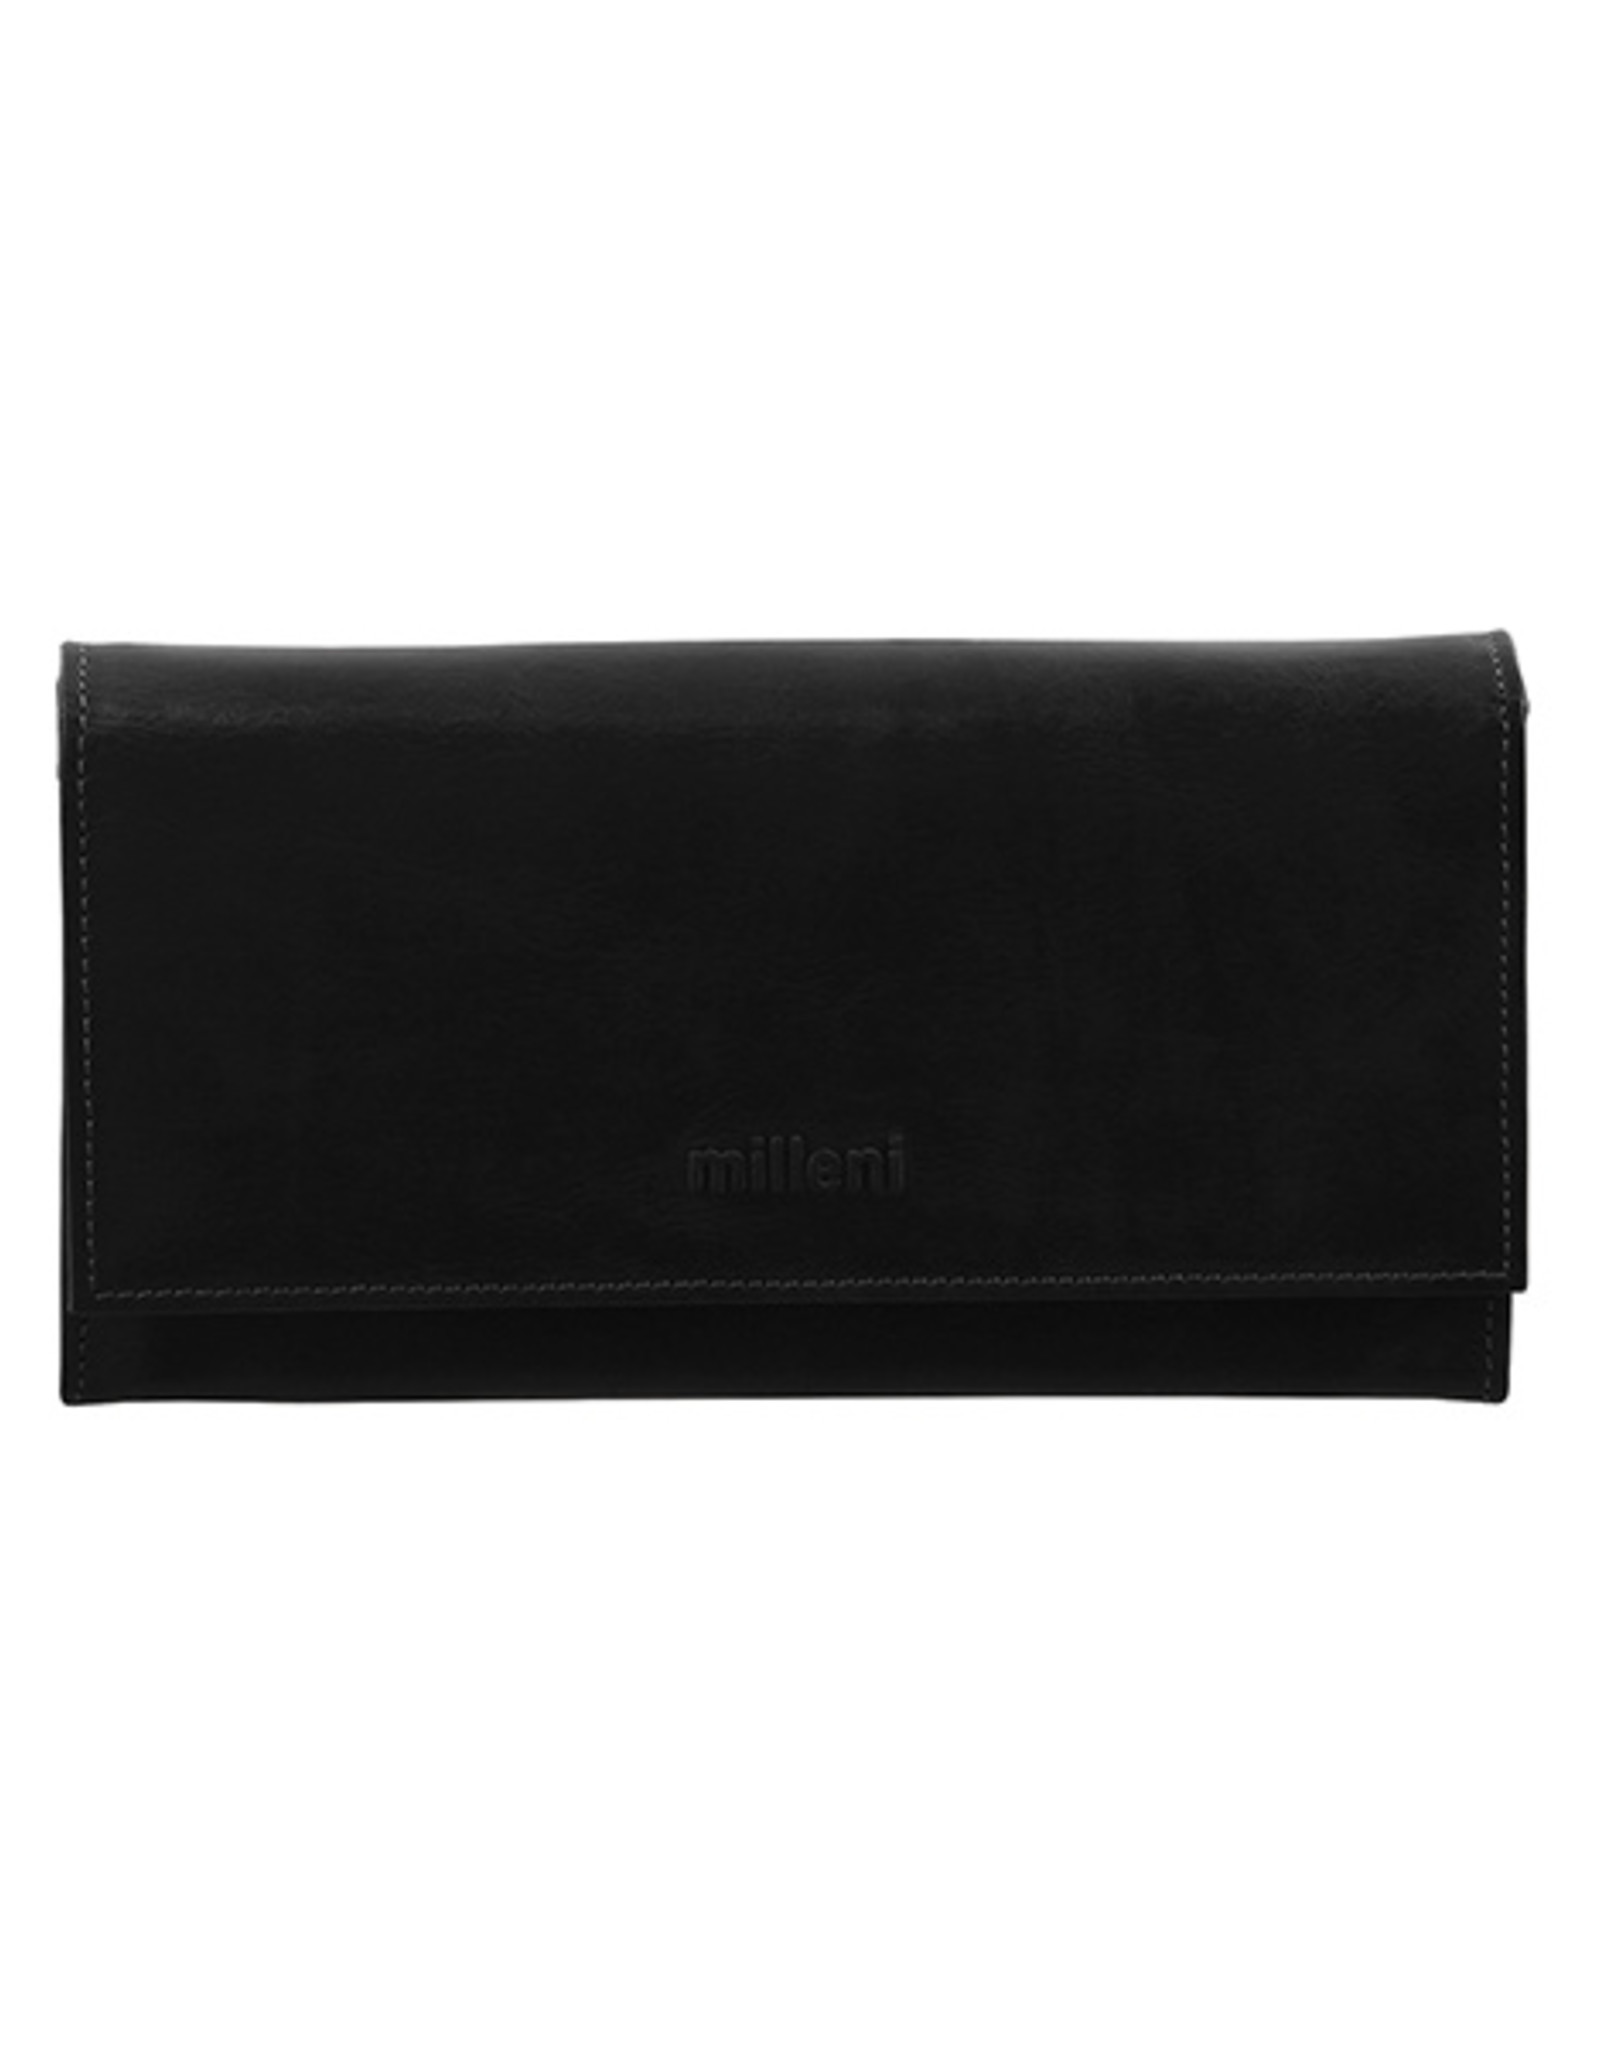 Milleni Leather Ladies Wallet - Black (C2886)